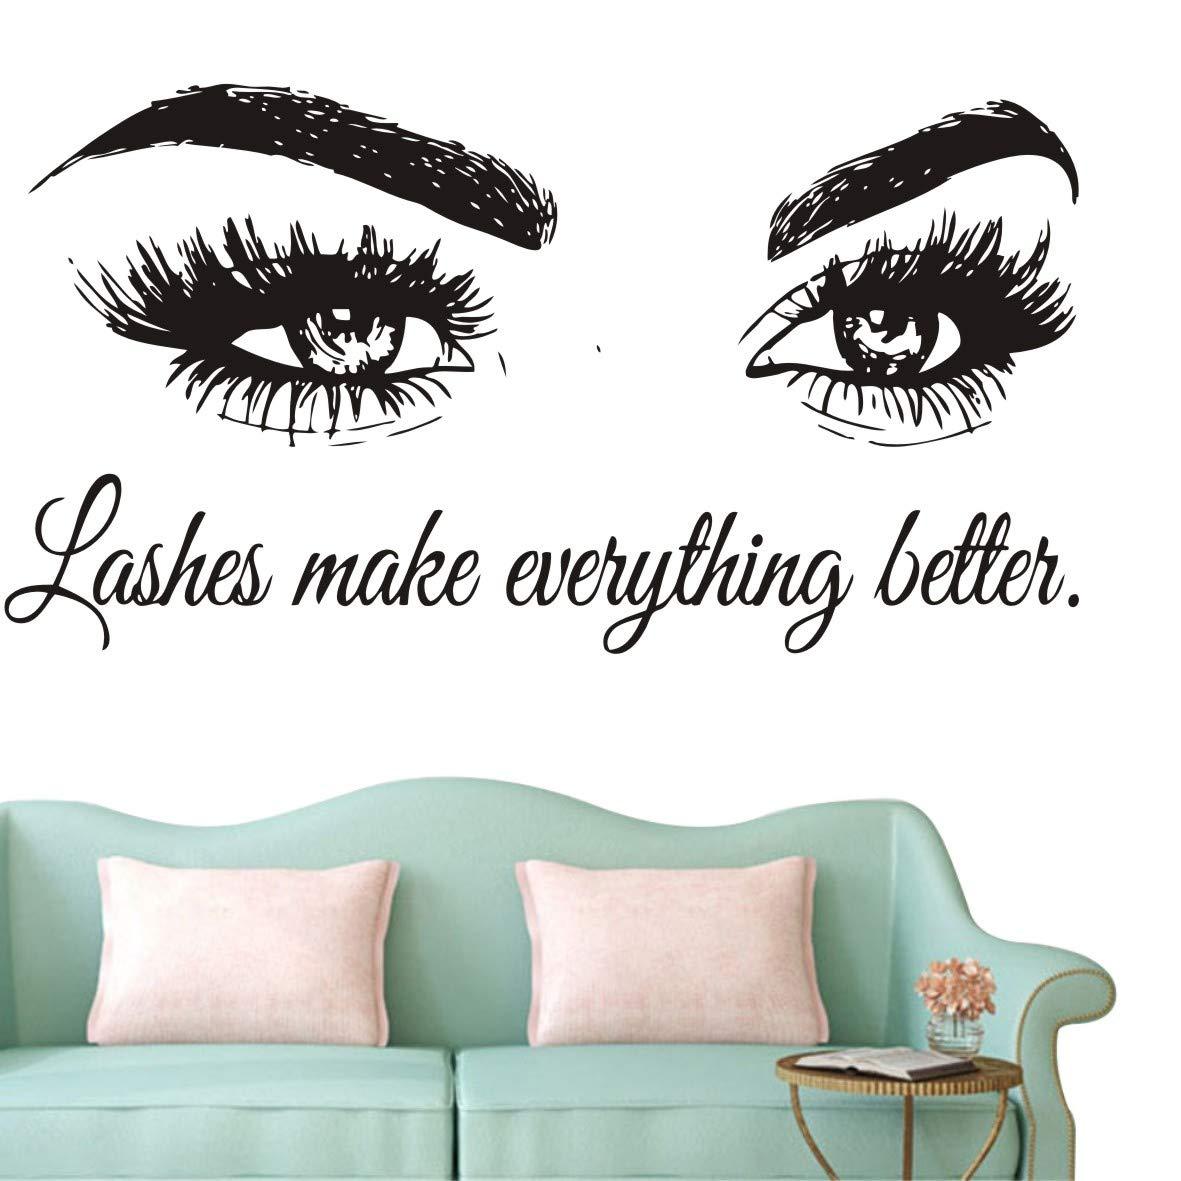 Wall Decal Beauty Salon Quote Sticker Lashes Make everything Better Beautiful Eyes Eyelashes Lashes Extensions Brows Wall Sticker Make Up Wall Window Mural AY1075 (BLACK, 57X103CM) by YOYOYU ART HOME DECOR (Image #1)